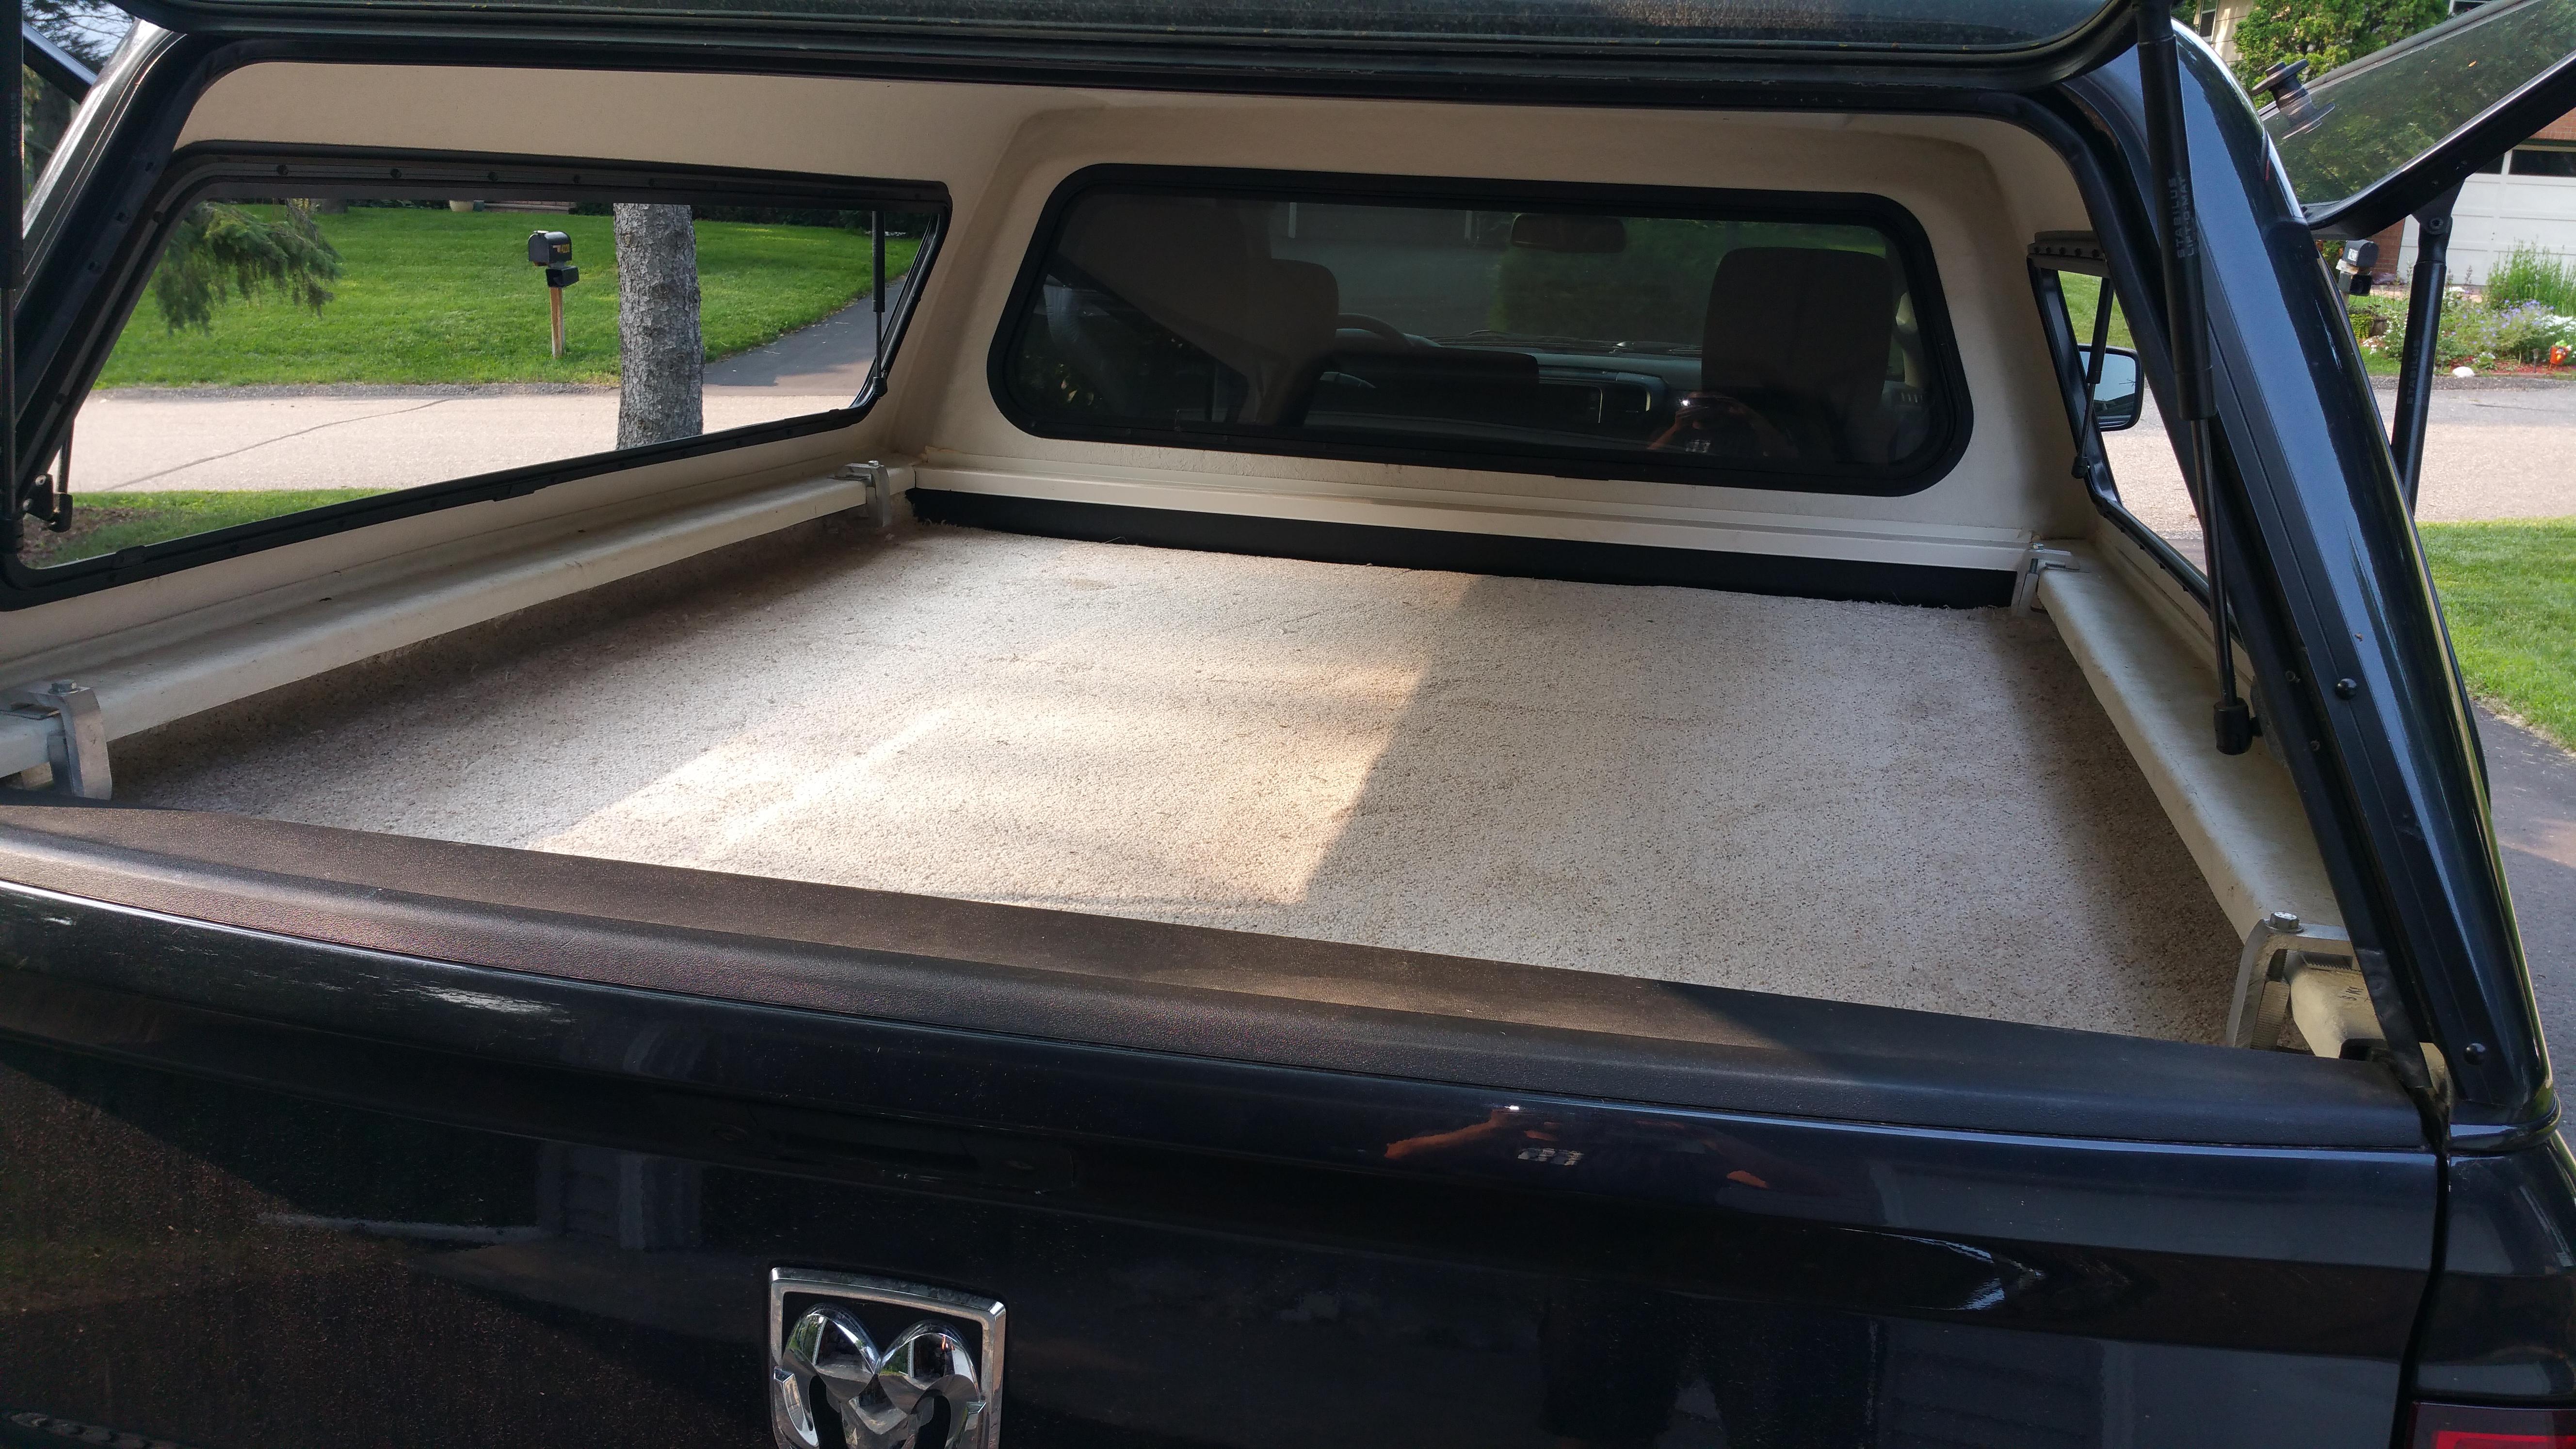 Pickup truck camping platform jhydro power blog pickup truck camping platform sciox Choice Image